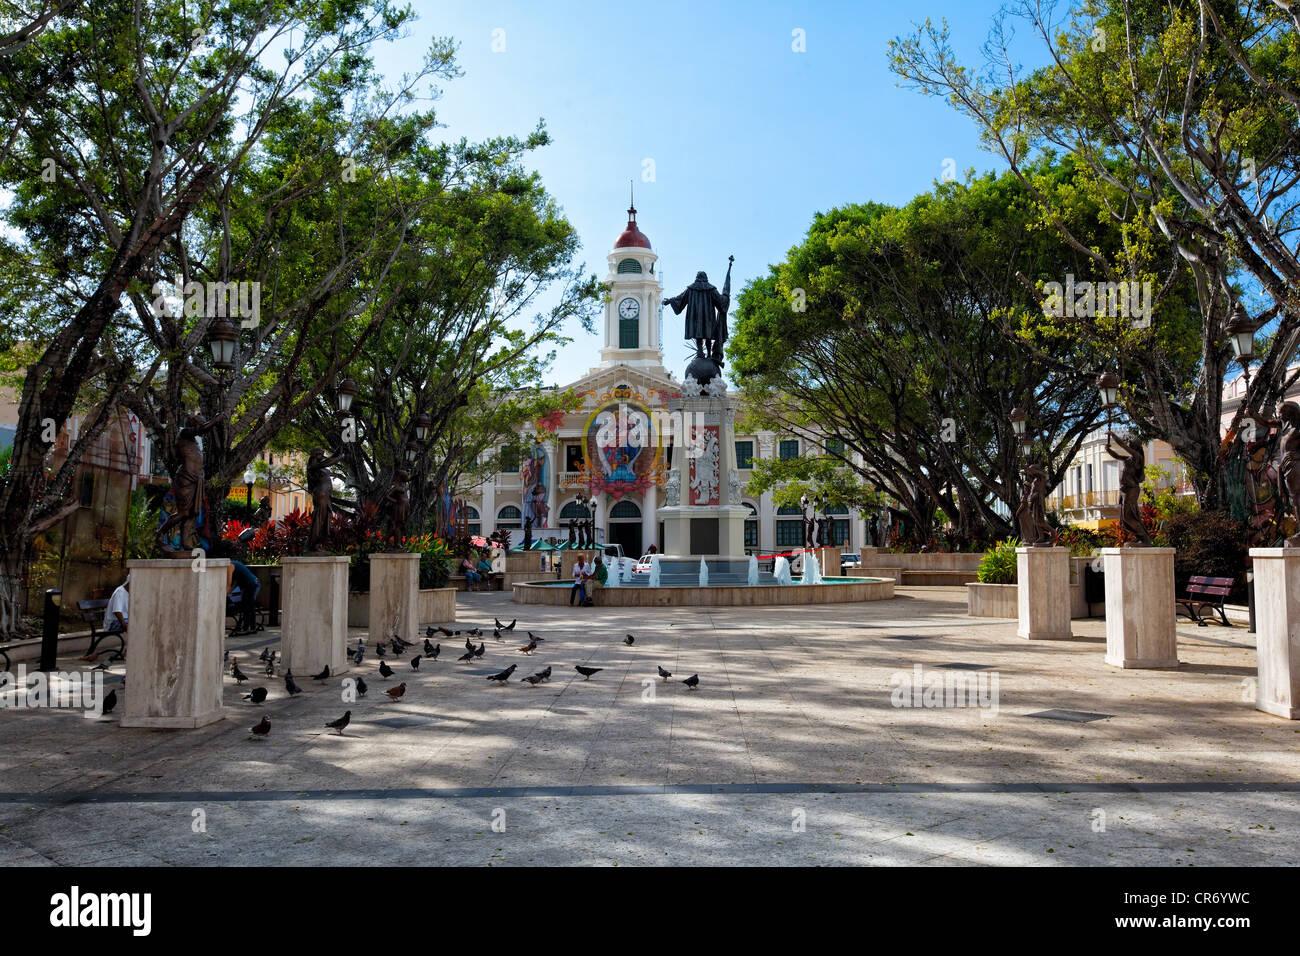 Columbus Square with the City Hall, Mayaguez, Puerto Rico - Stock Image